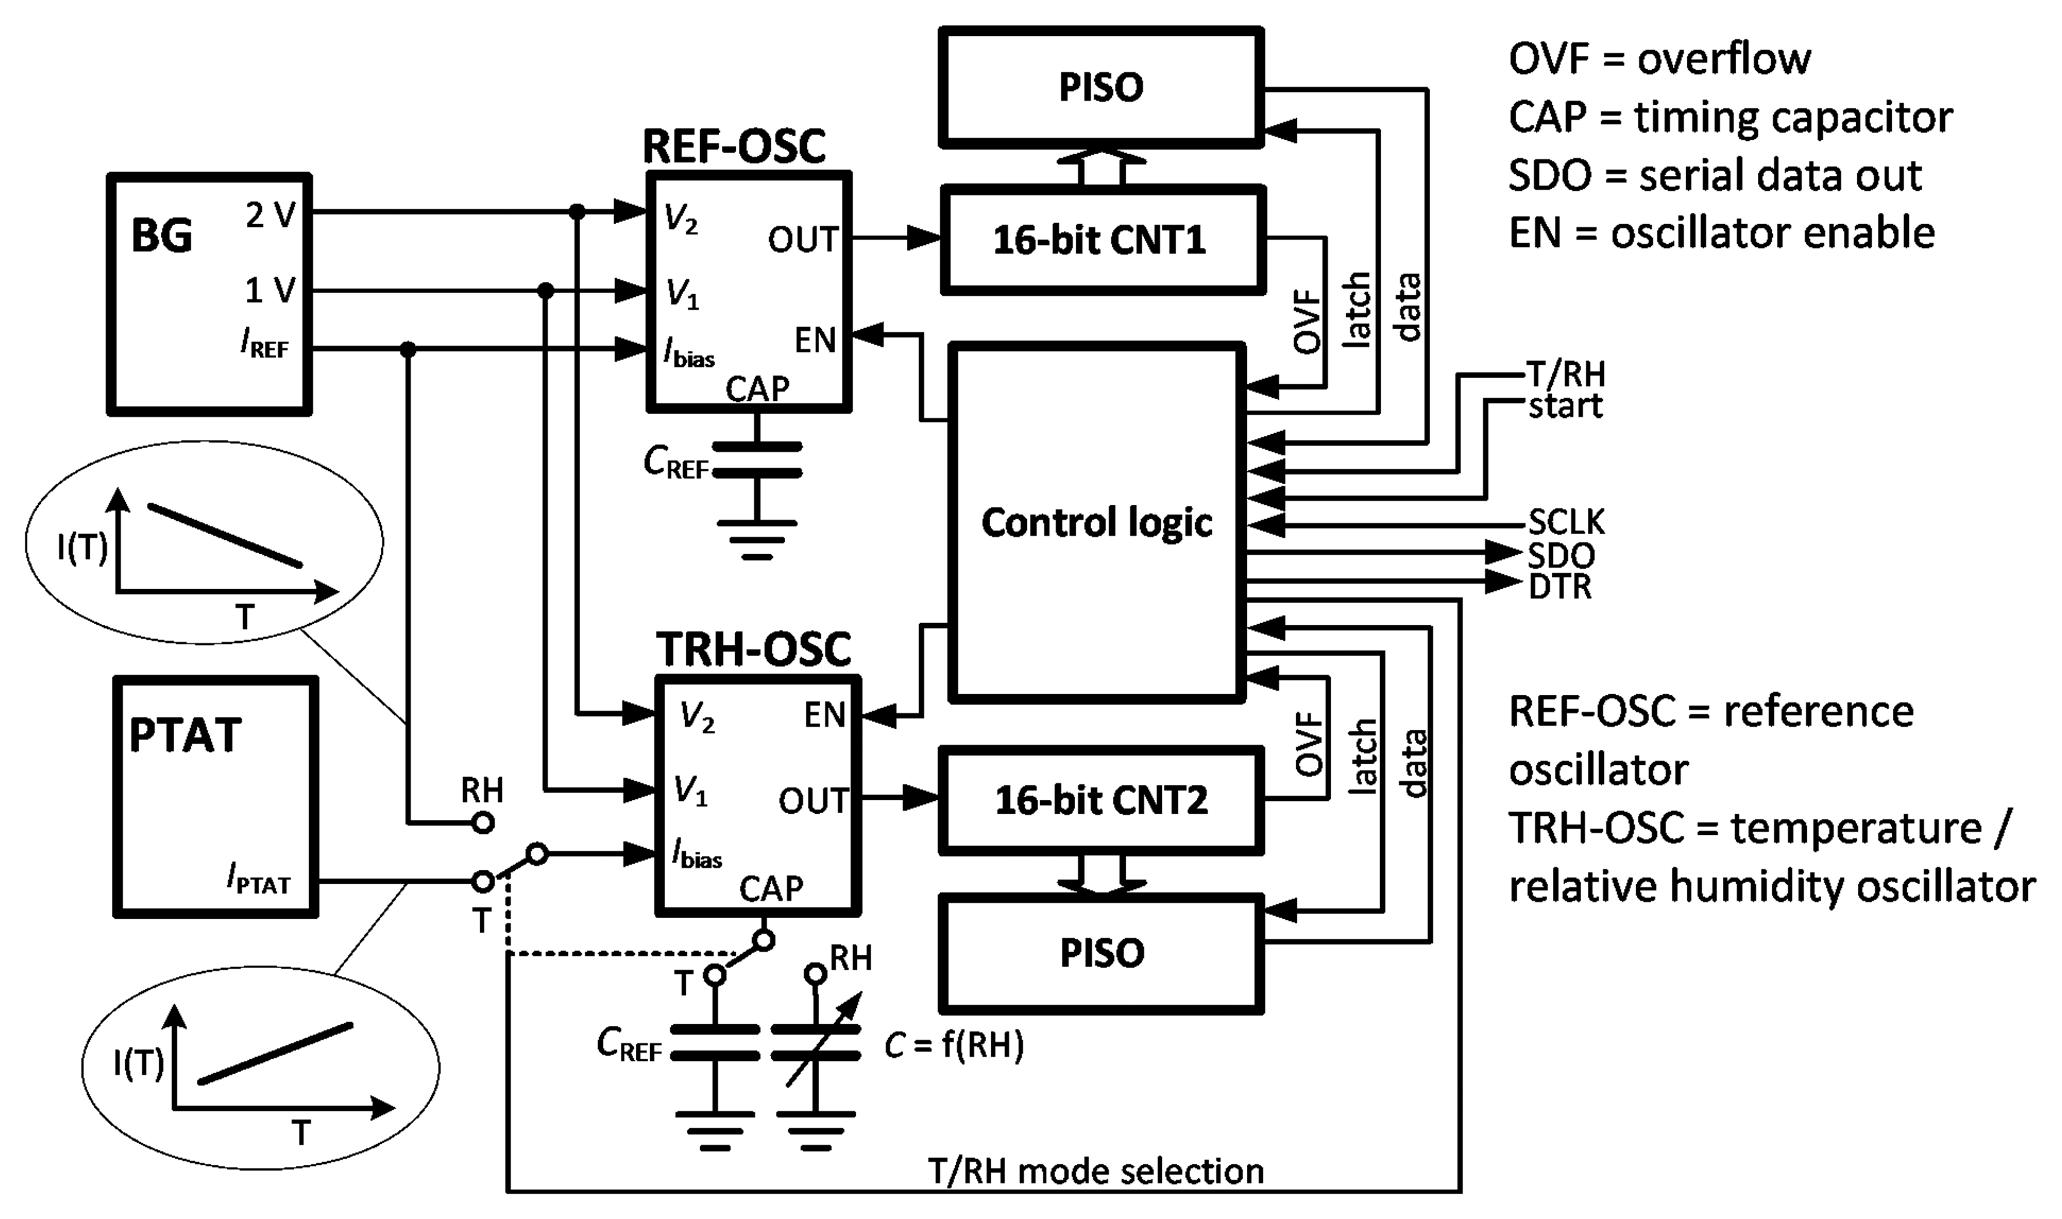 Sensors Free Full Text A Cmos Smart Temperature And Humidity Temp Wiring Diagram 14 17192f1 1024